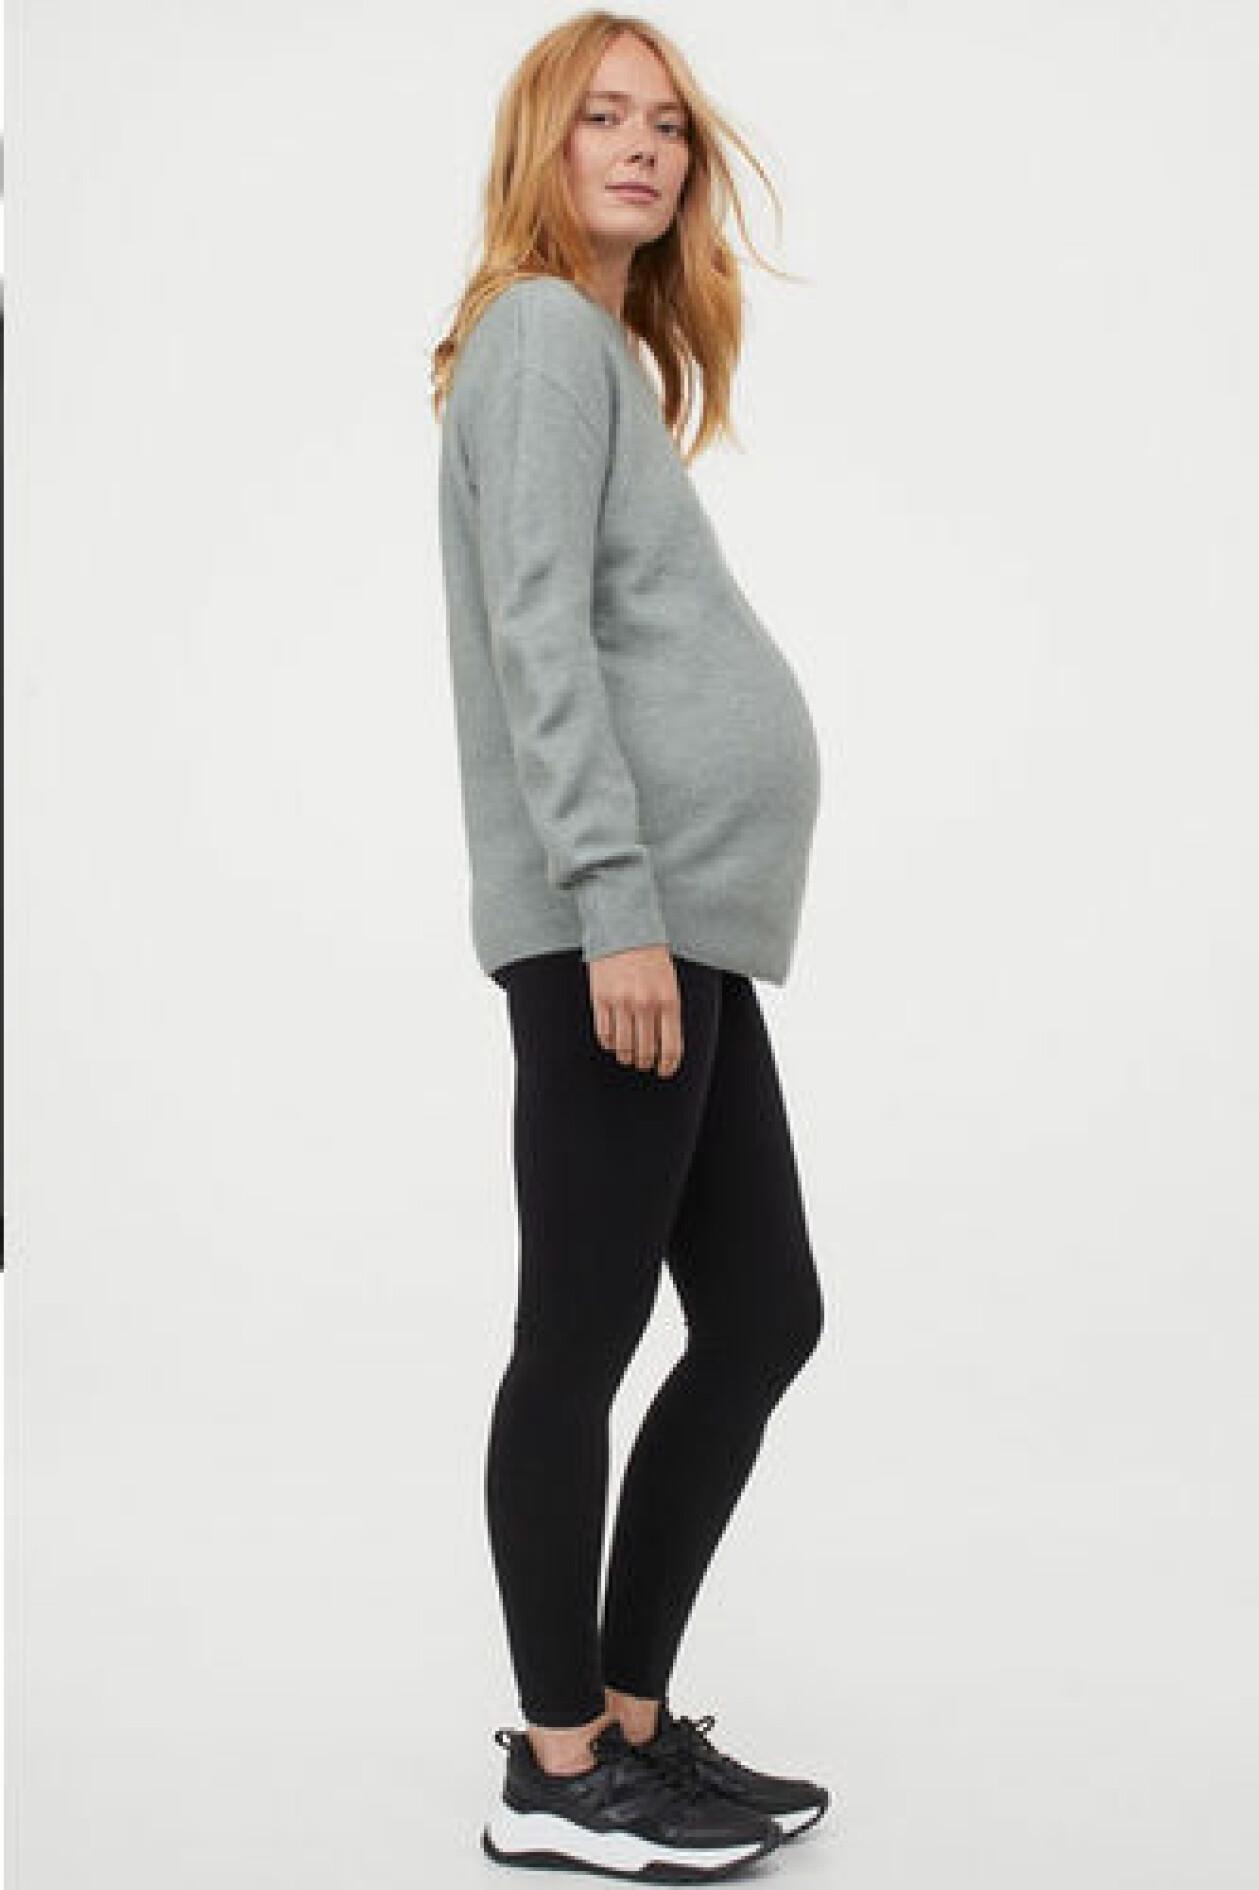 Svarta gravidleggings i seamless-modell från H&M.